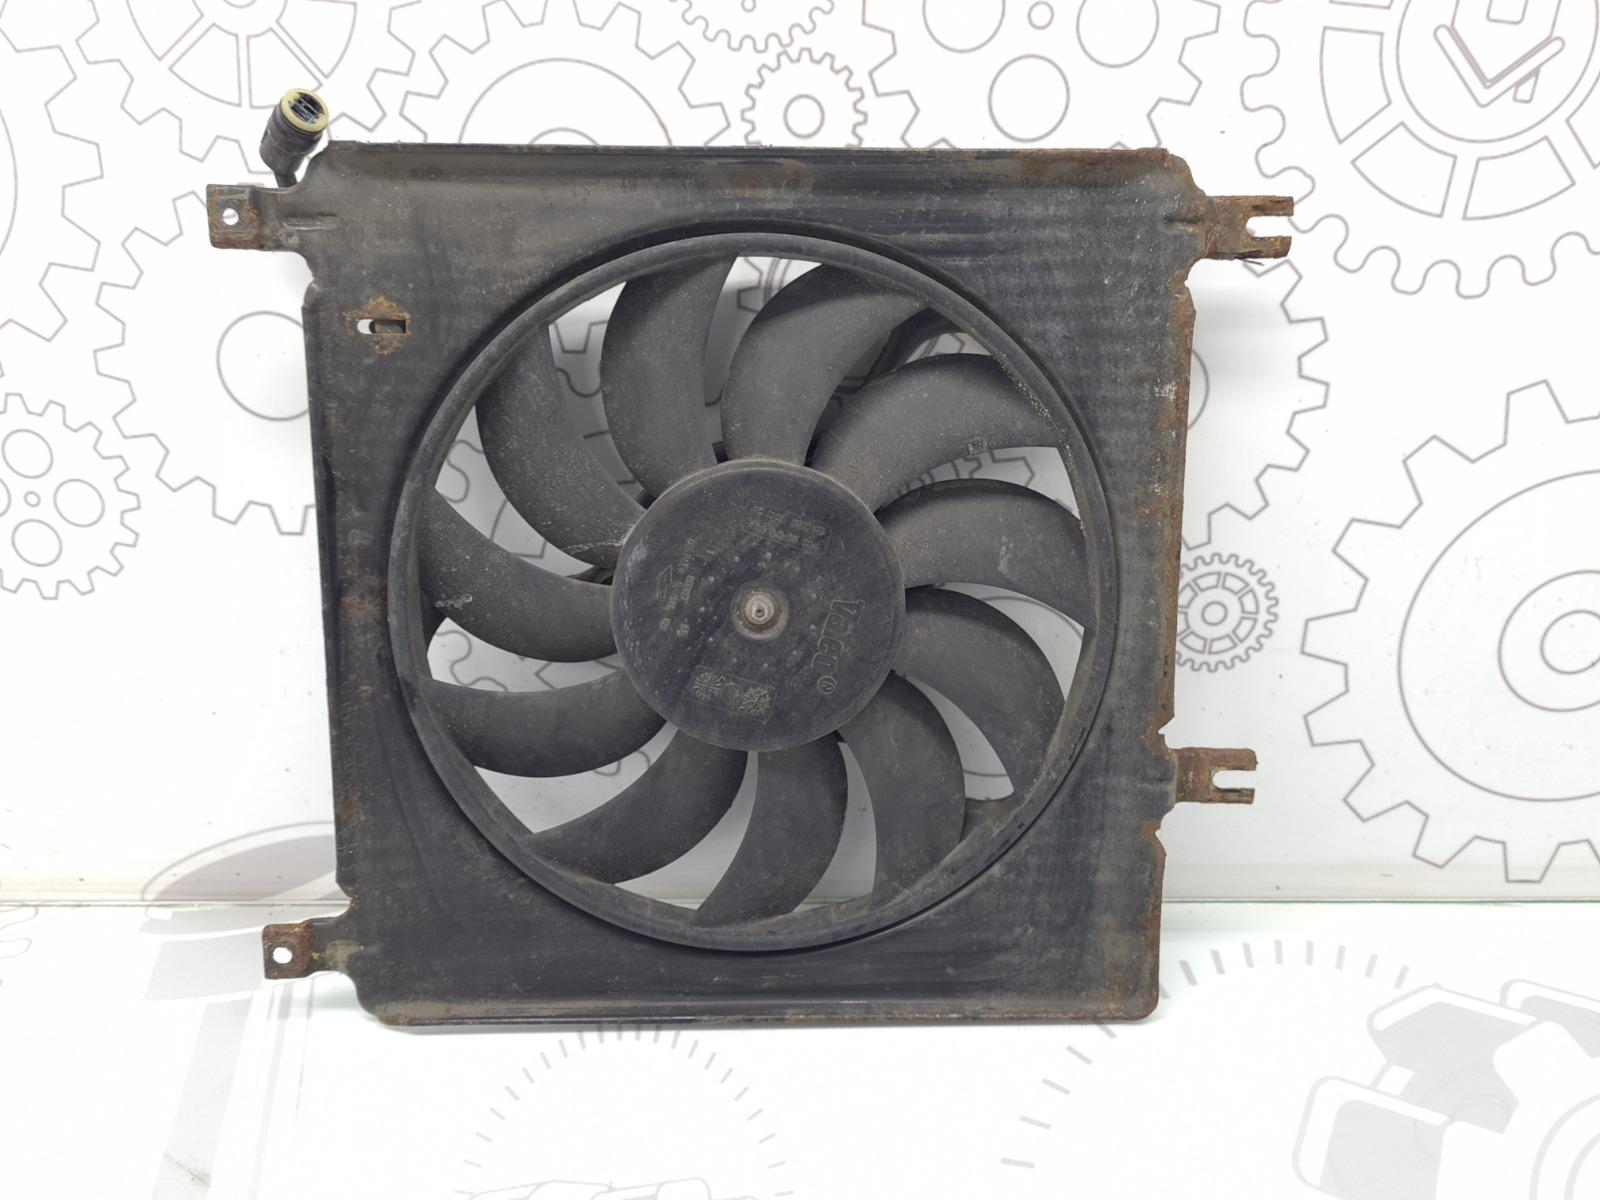 Вентилятор радиатора Suzuki Wagon R 1.3 I 2002 (б/у)